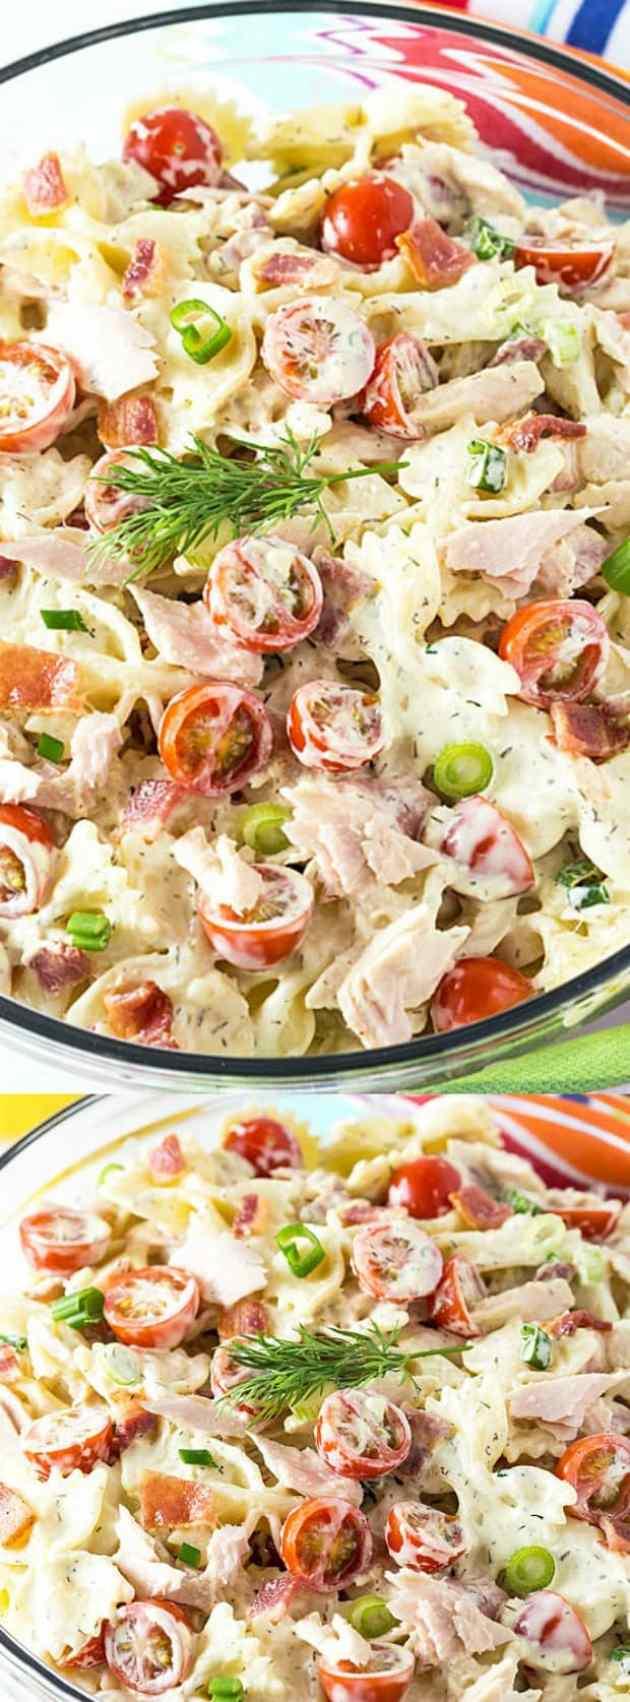 Tuna And Bacon Pasta Salad Longpin